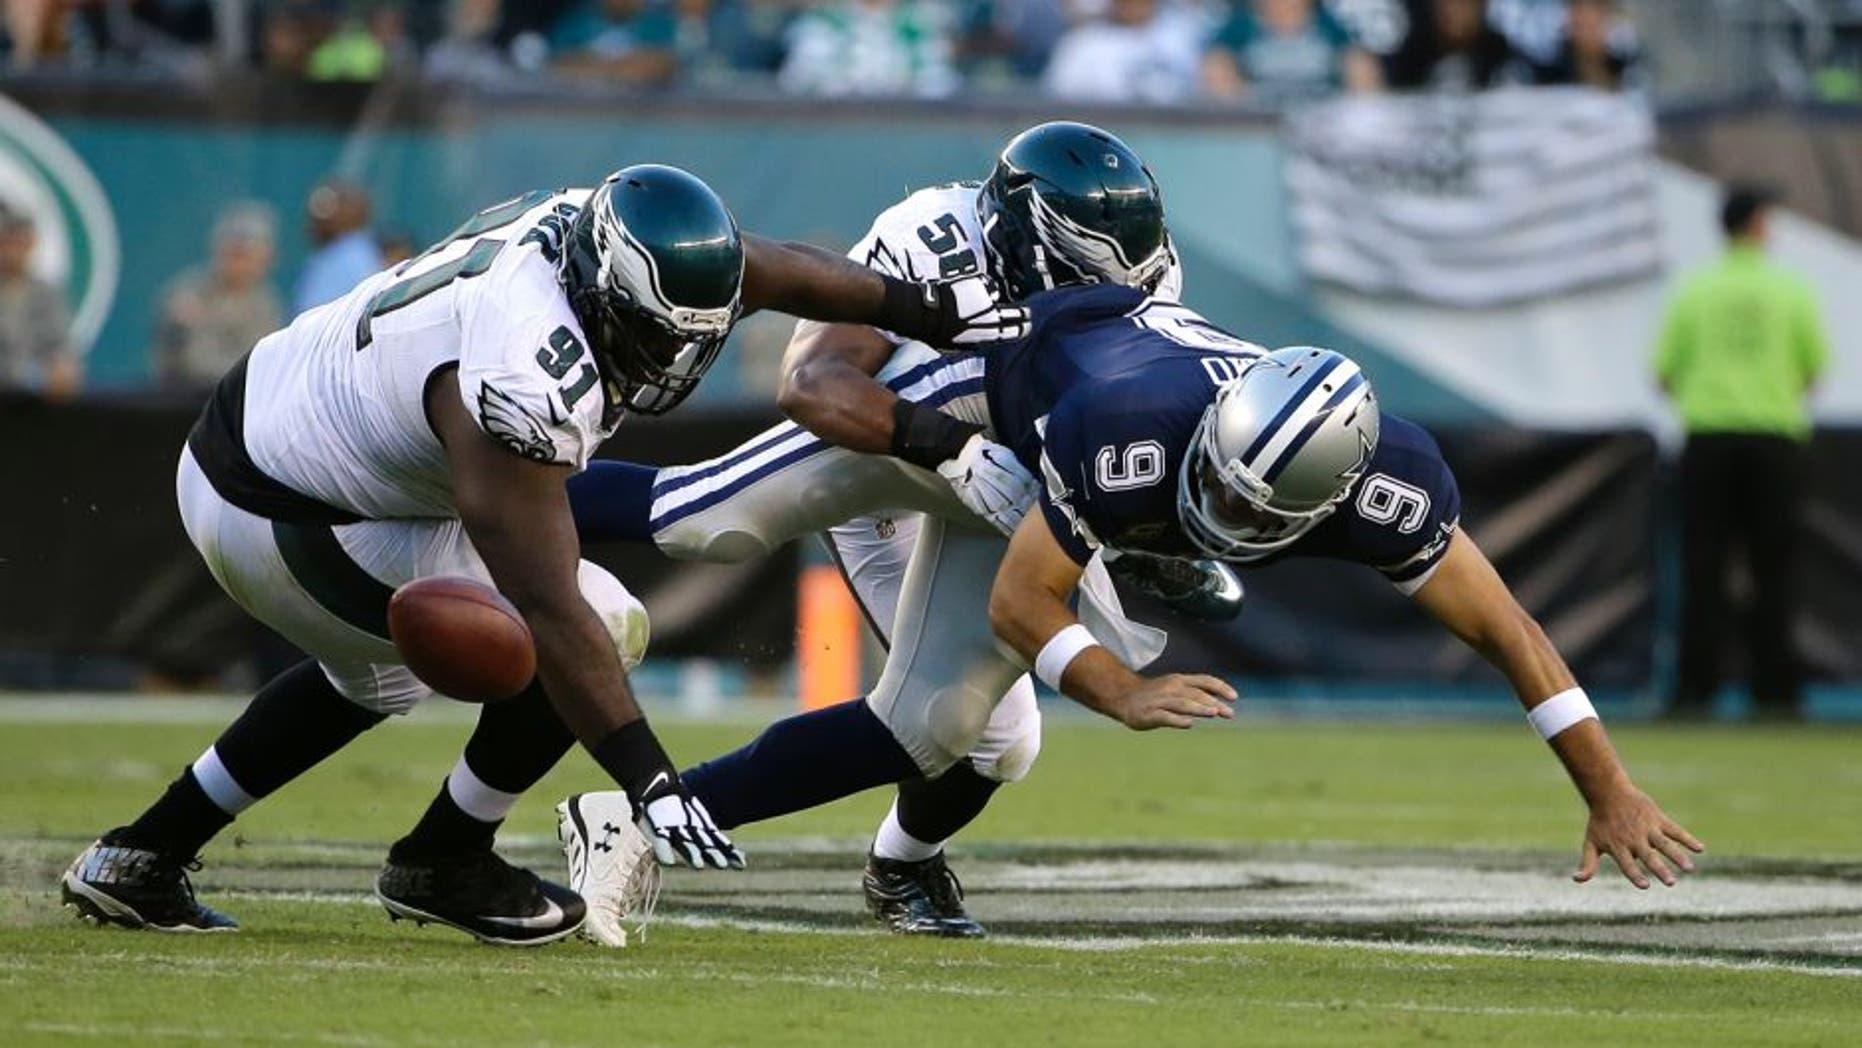 Dallas Cowboys' Tony Romo (9) fumbles the football against Philadelphia Eagles' Fletcher Cox (91) and Jordan Hicks (58) during the second half of an NFL football game, Sunday, Sept. 20, 2015, in Philadelphia. (AP Photo/Matt Rourke)